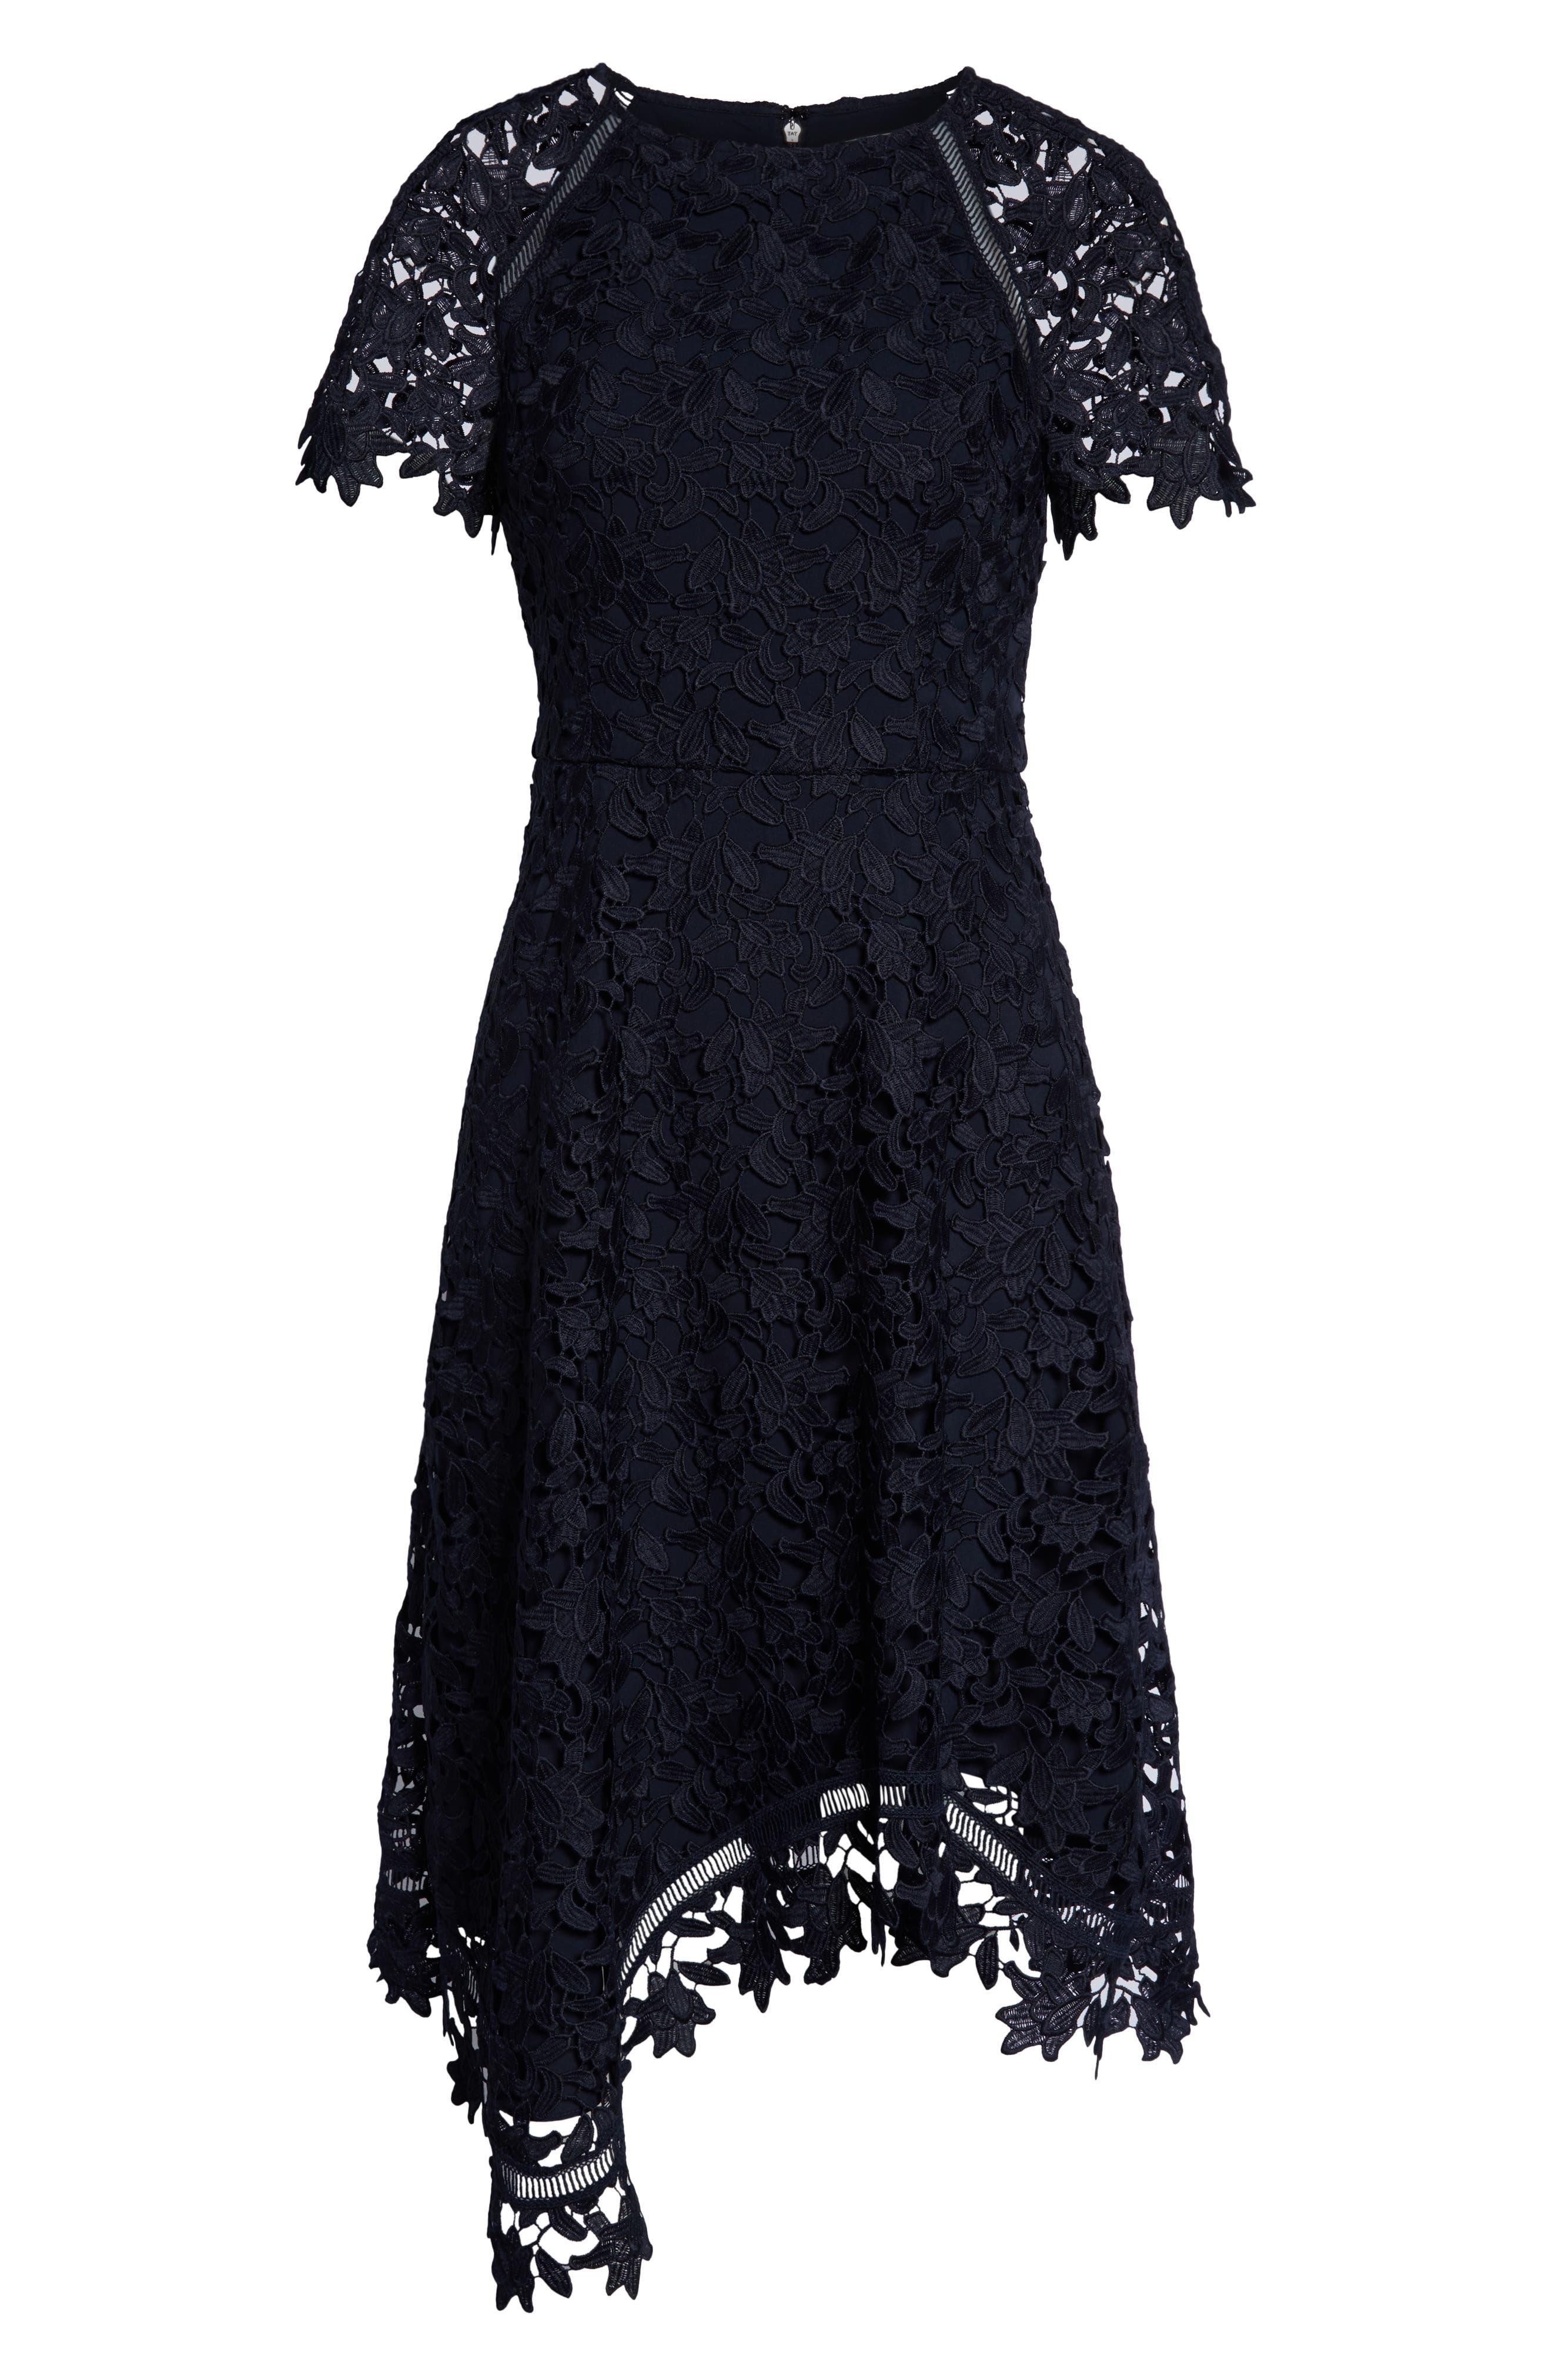 ELIZA J, Asymmetrical Lace Dress, Alternate thumbnail 7, color, NAVY